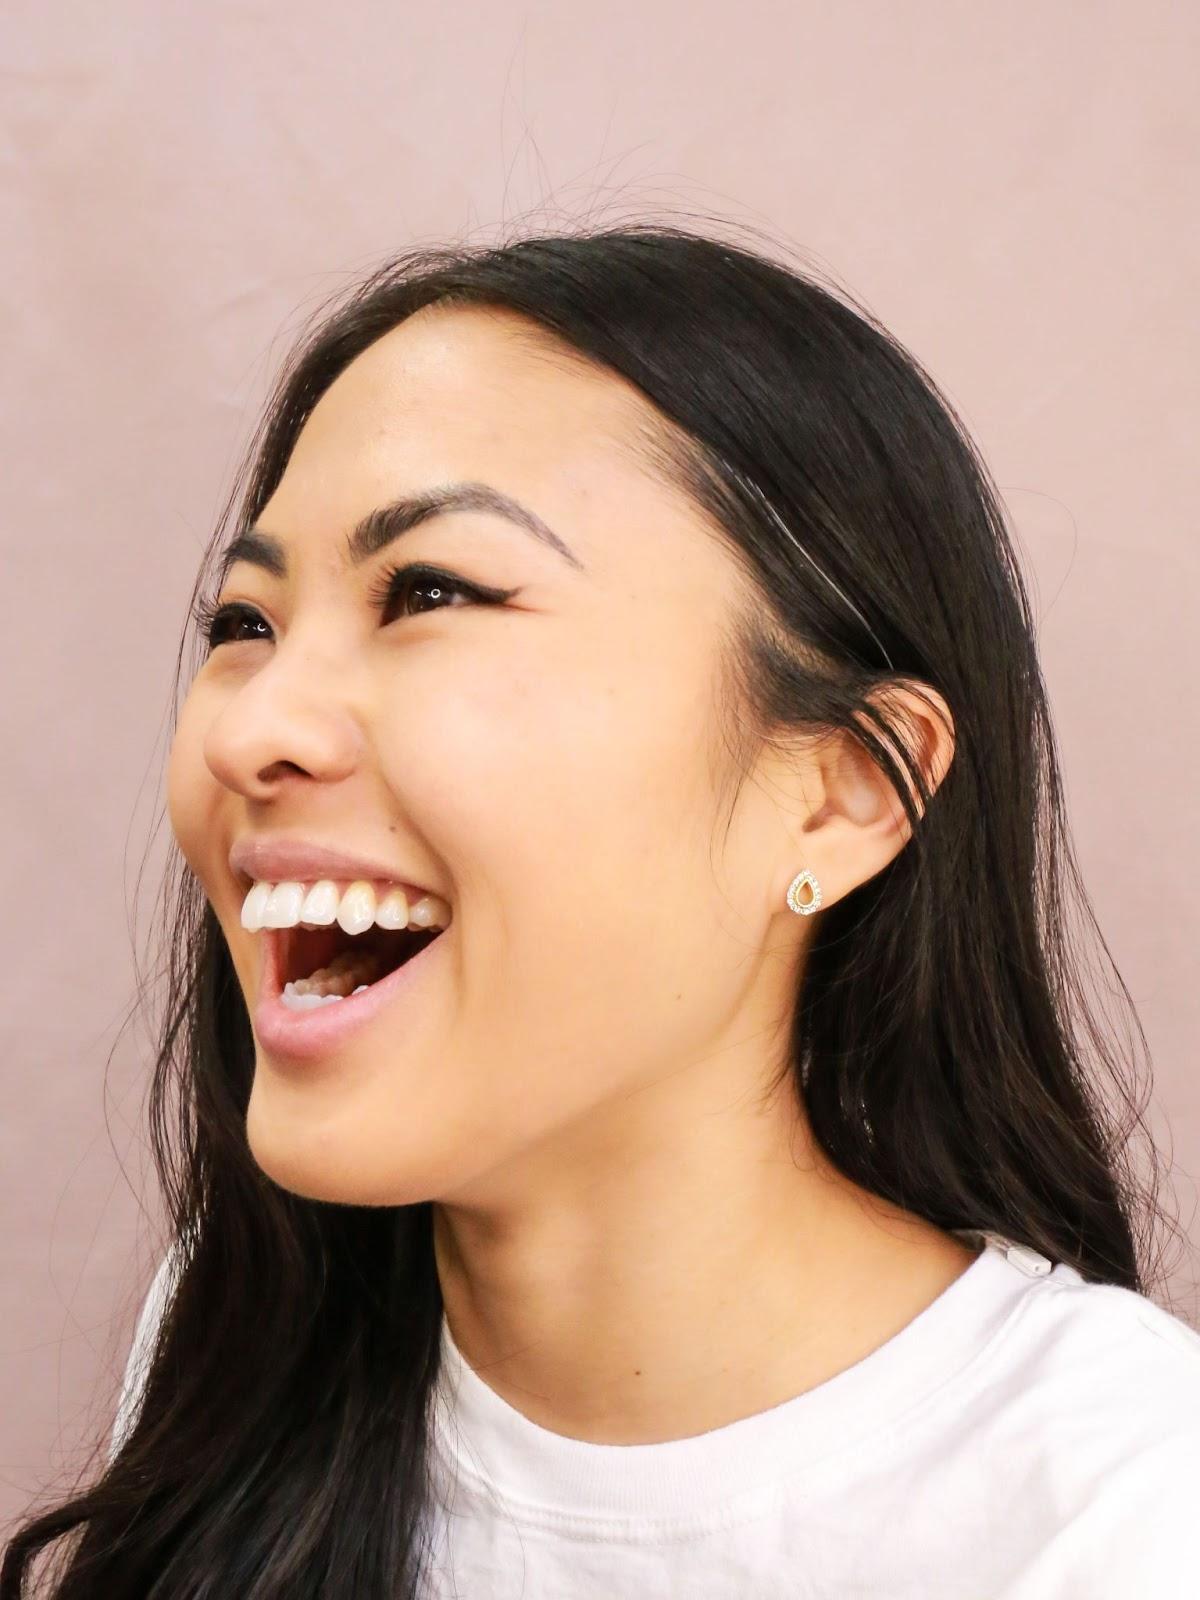 Dainty Sustainable Earrings   Fair Anita